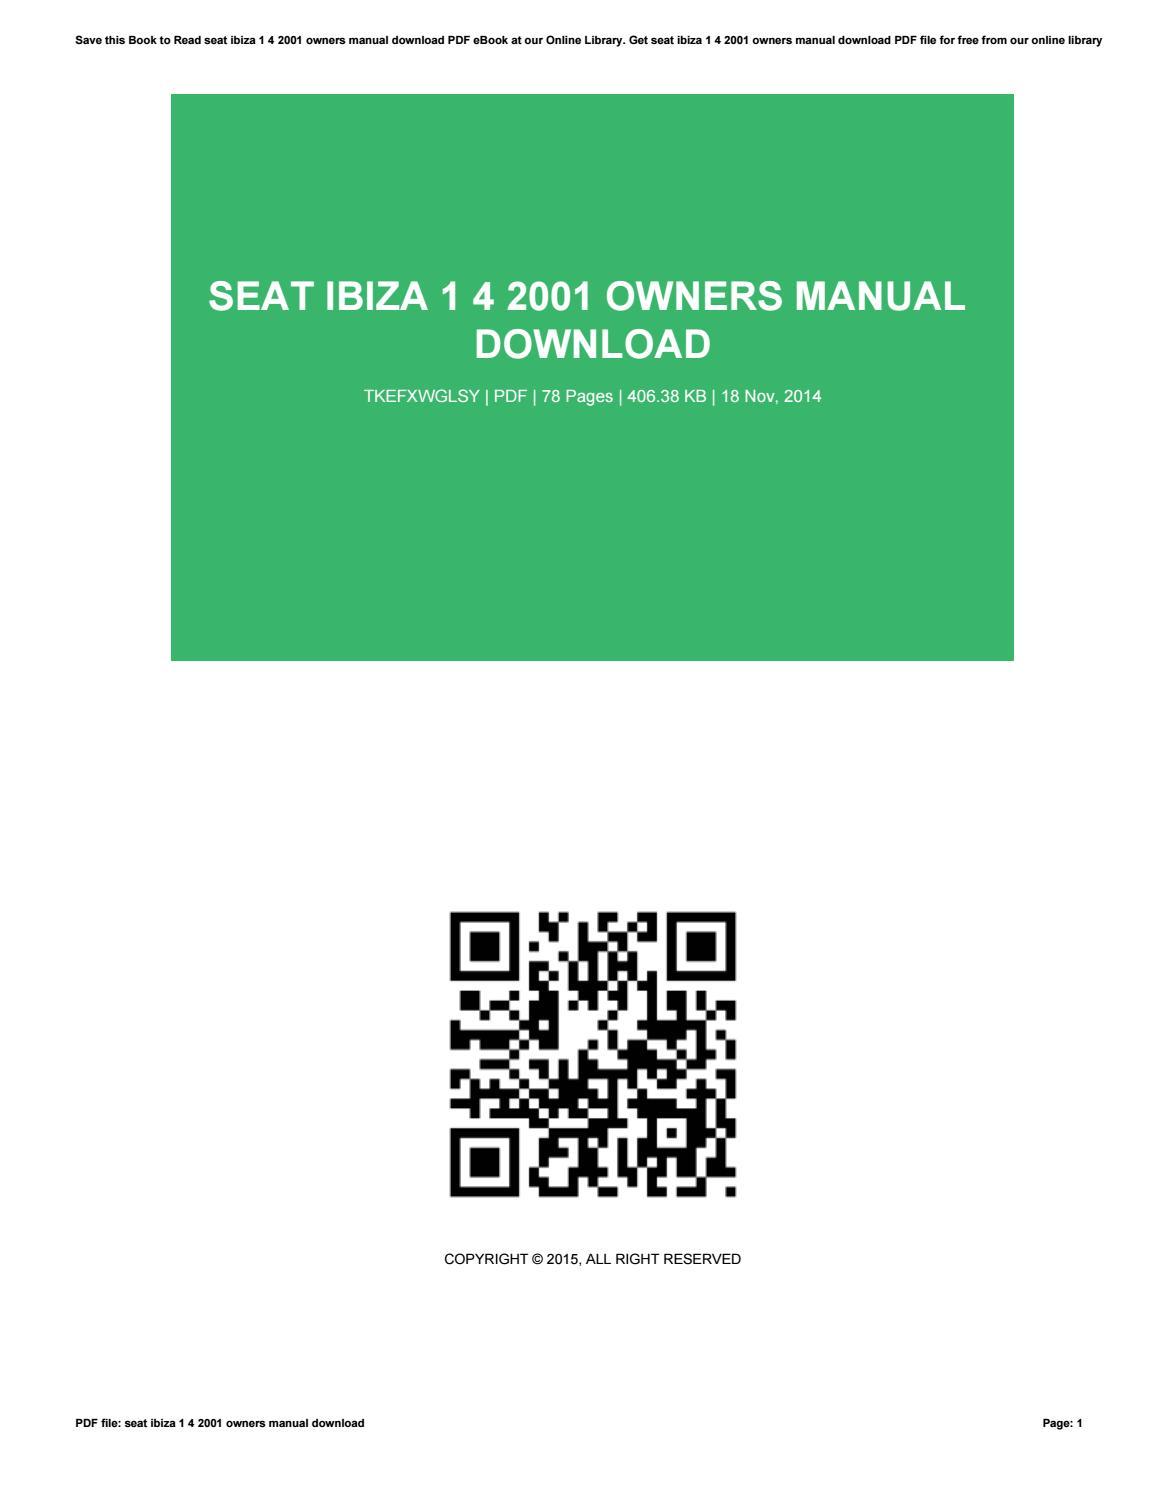 seat ibiza drivers manual